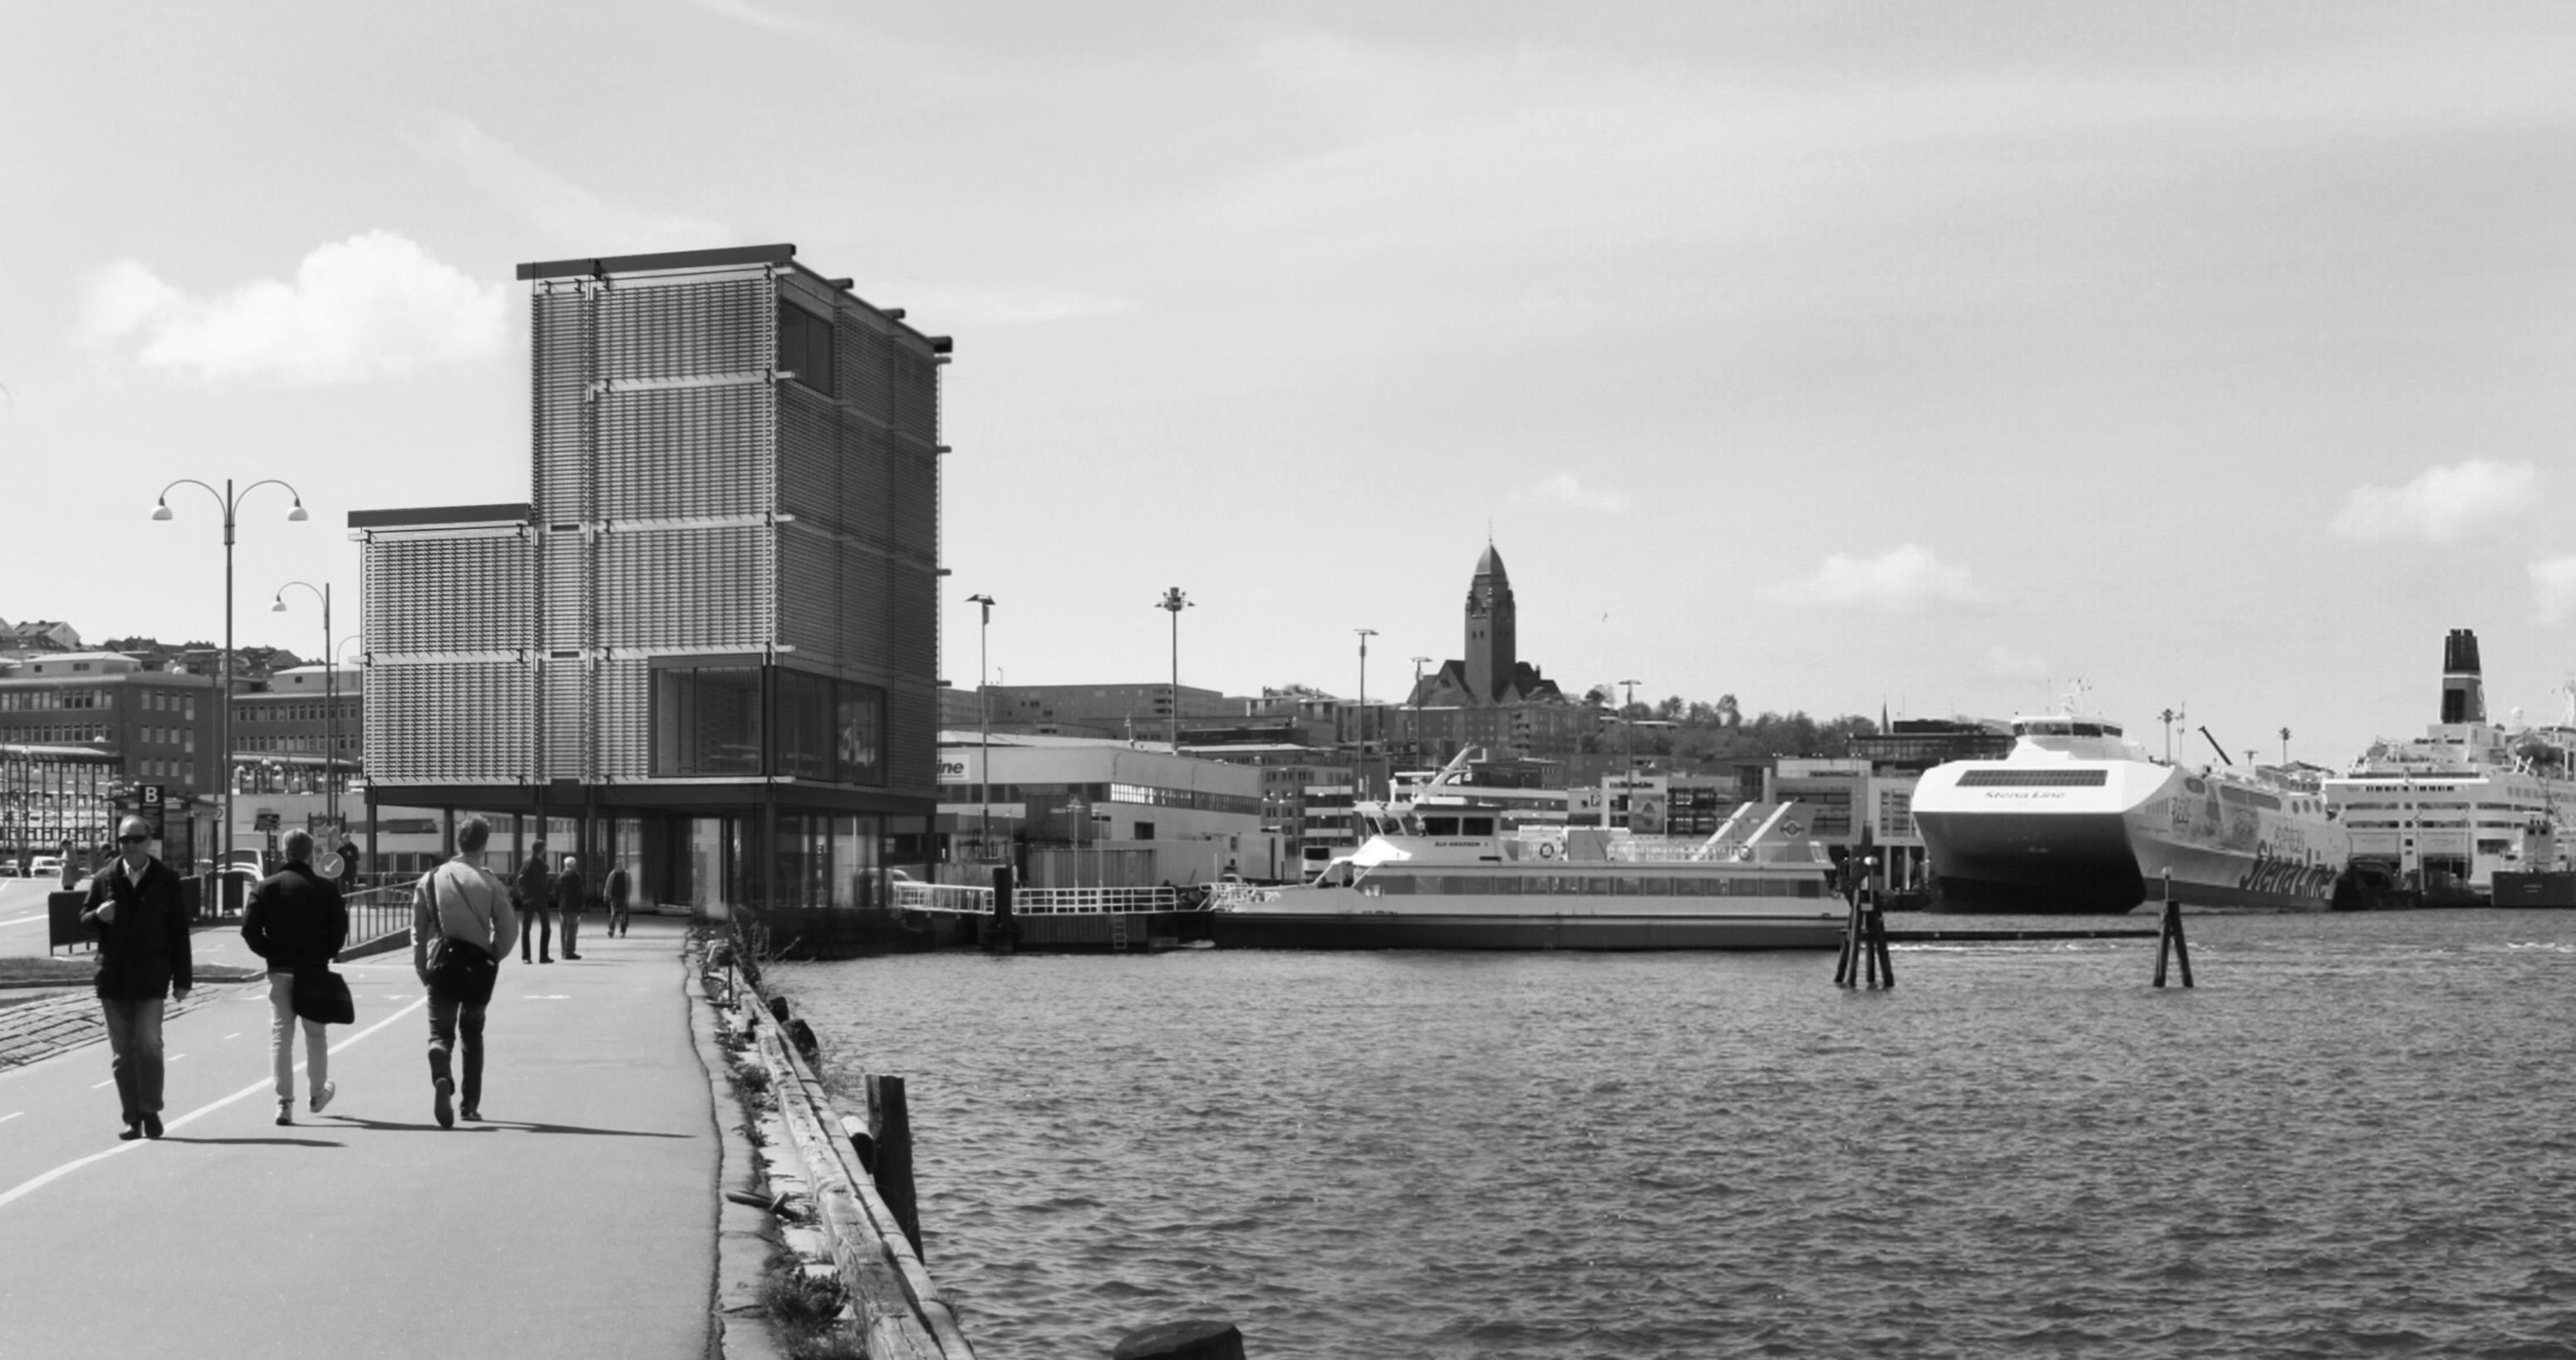 Pawilon w Göteborgu